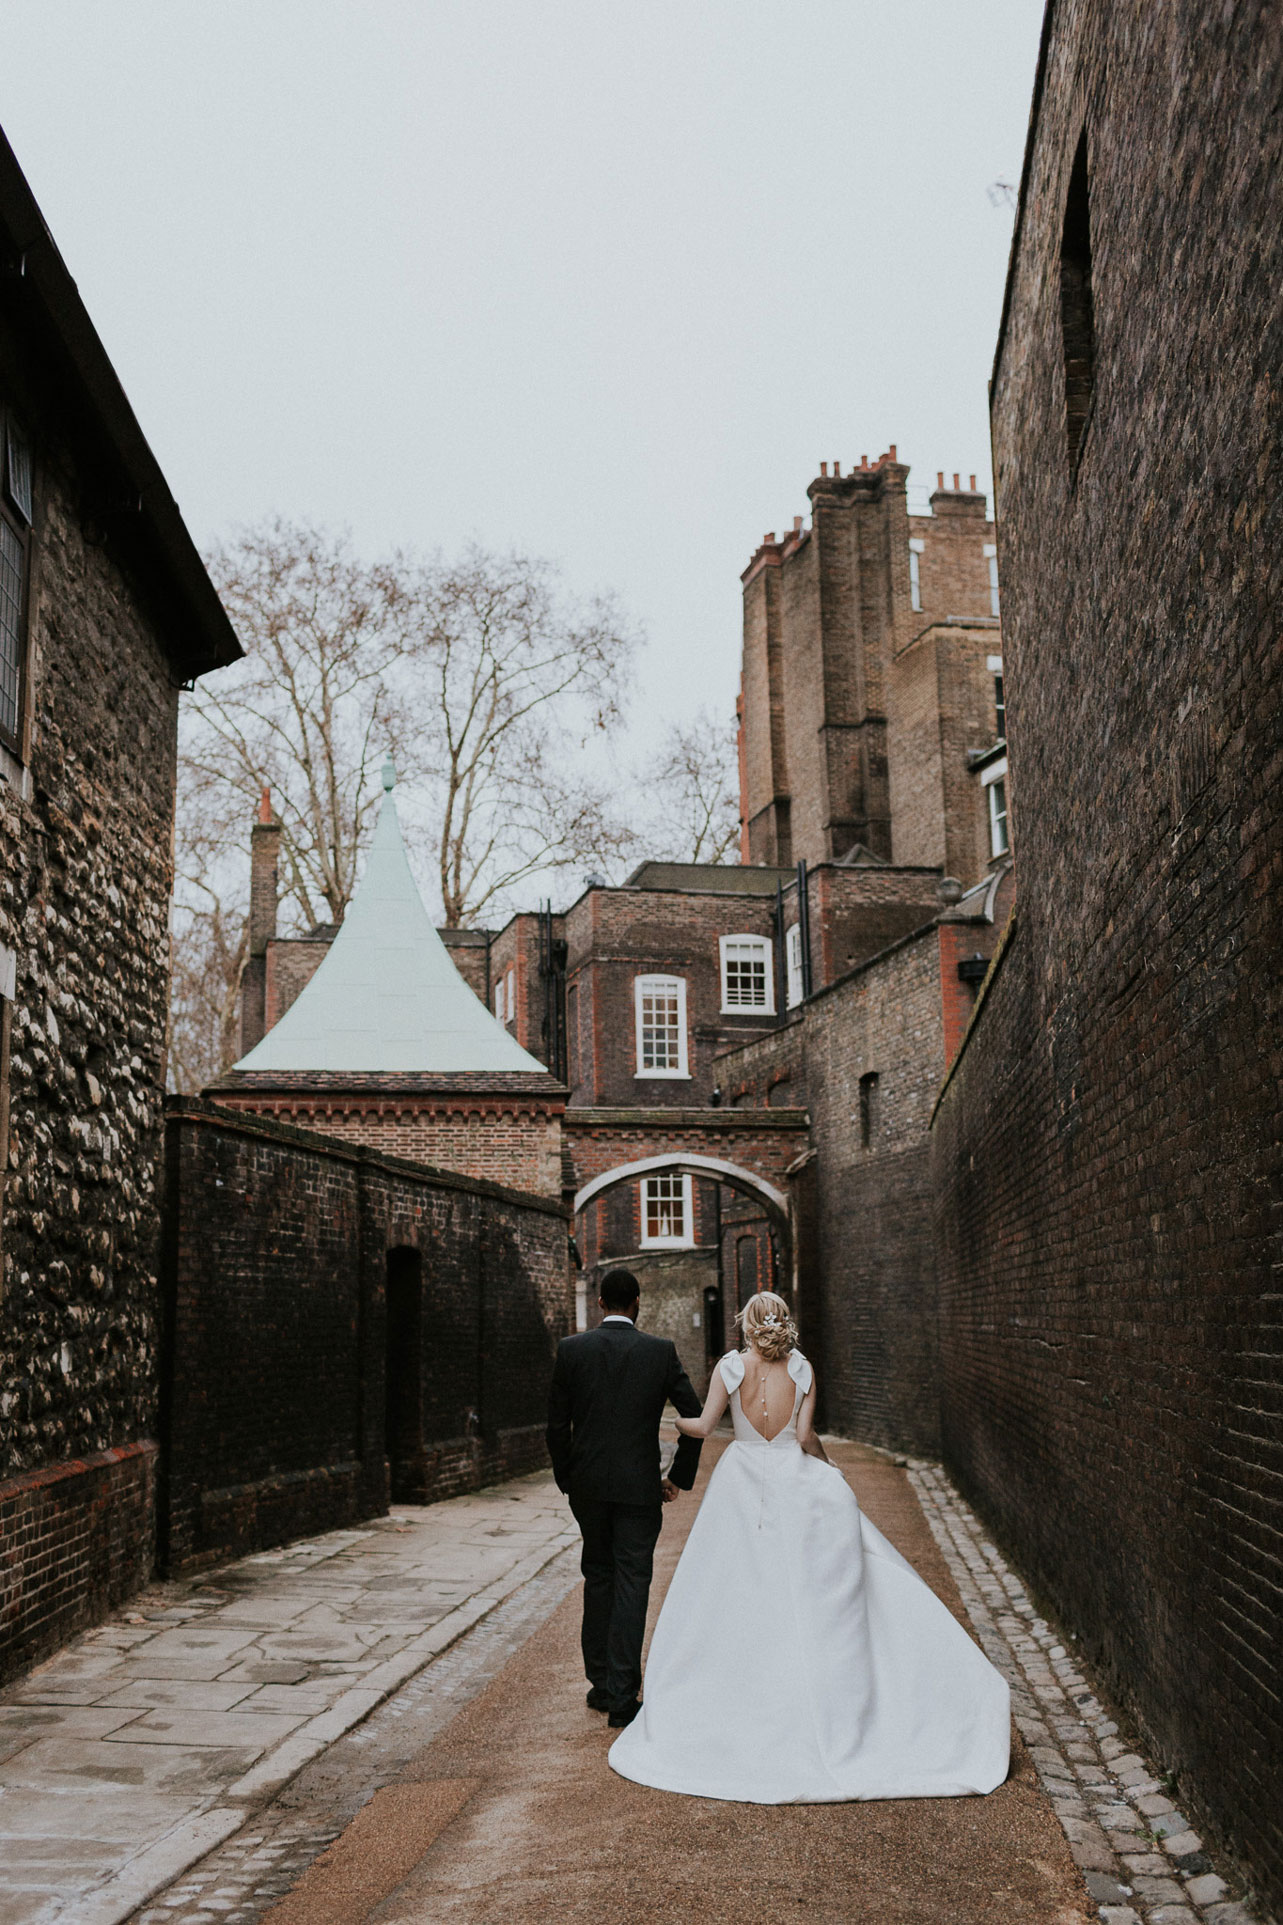 CharterHouse-historic-londong-wedding-venue-jesus-peiro-dress-6.jpg